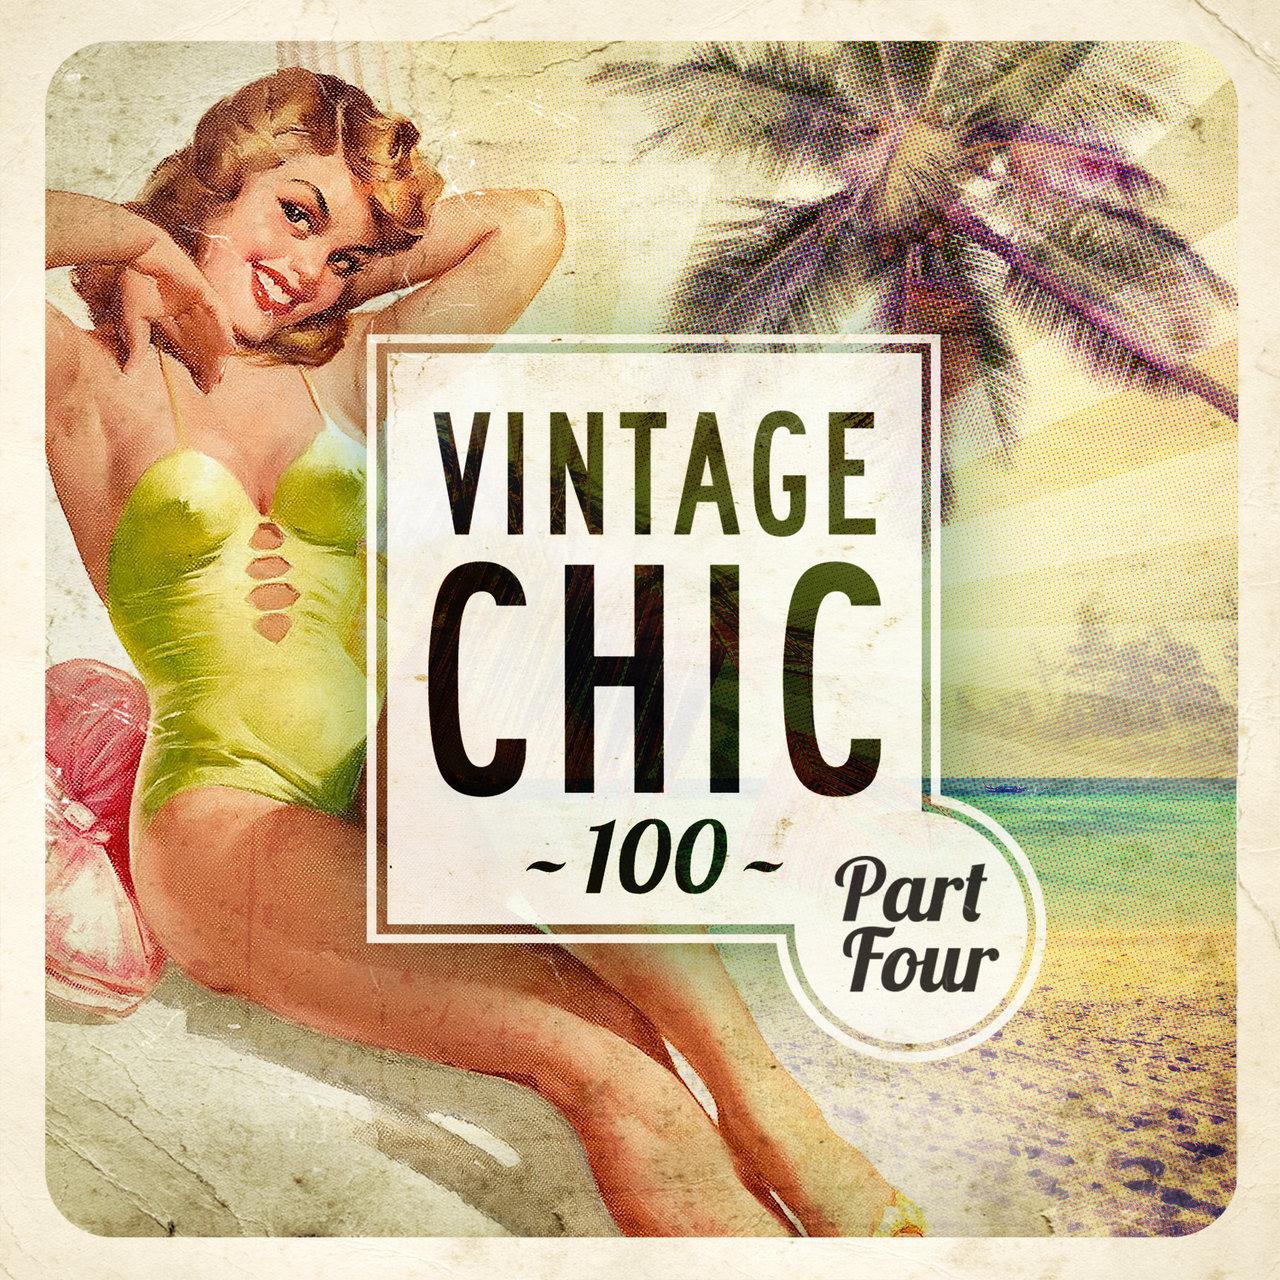 Tidal listen to nikki ocean on tidal - Vintage and chic love ...